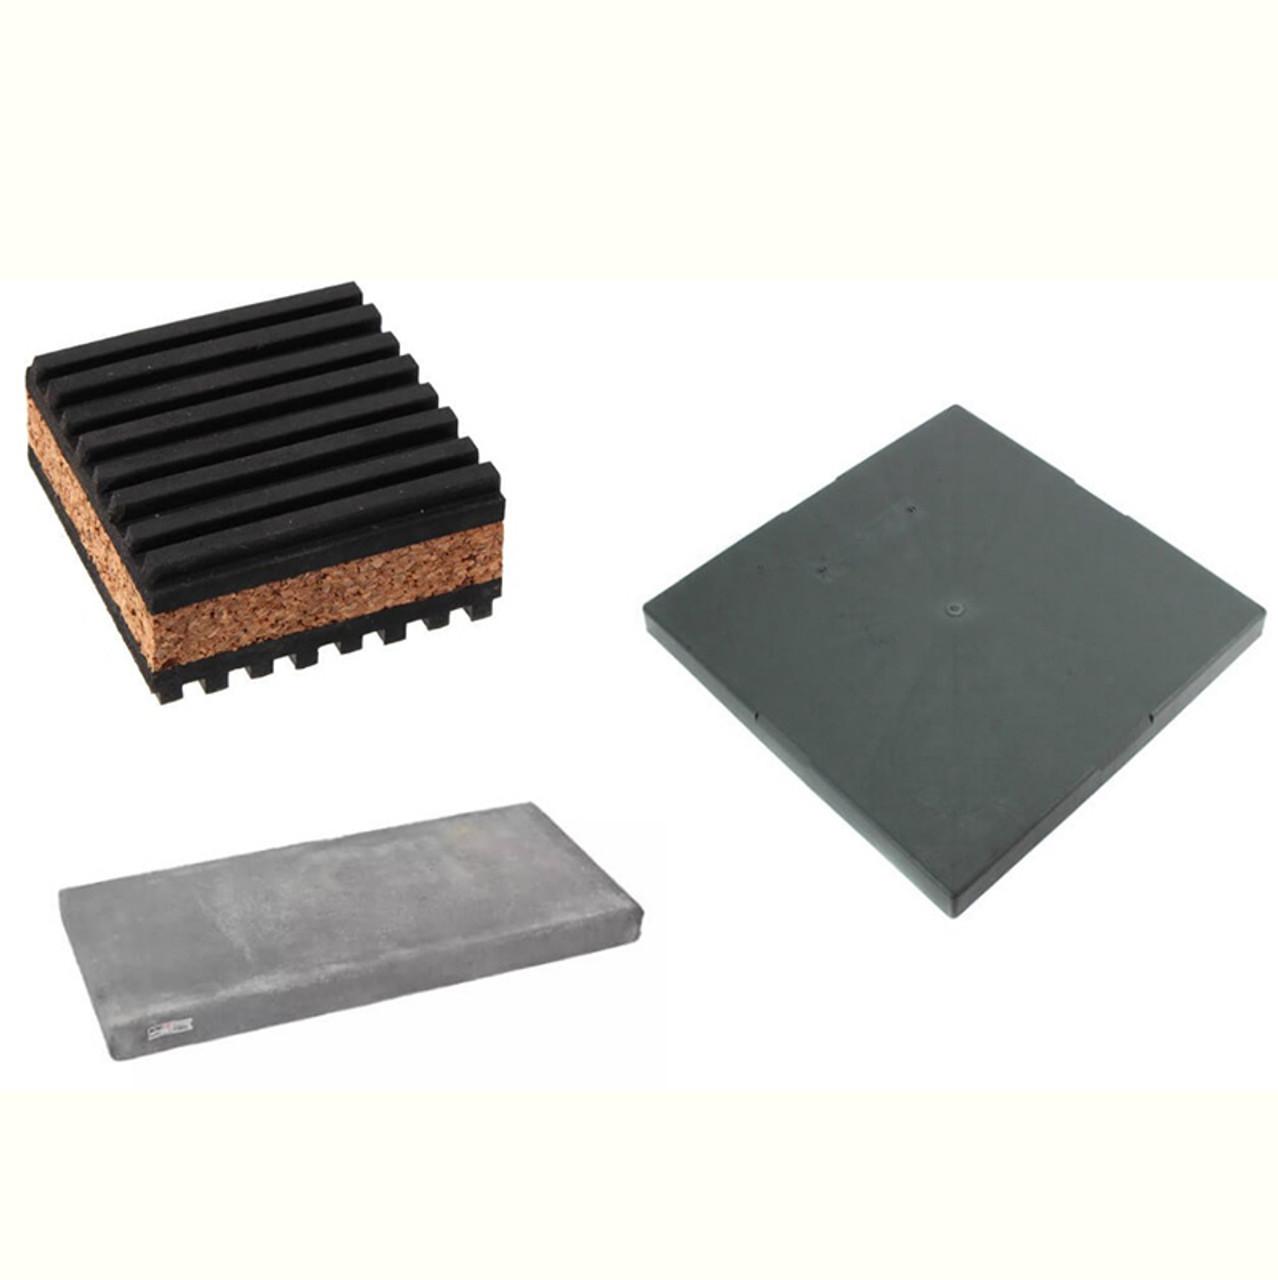 Equipment Pads